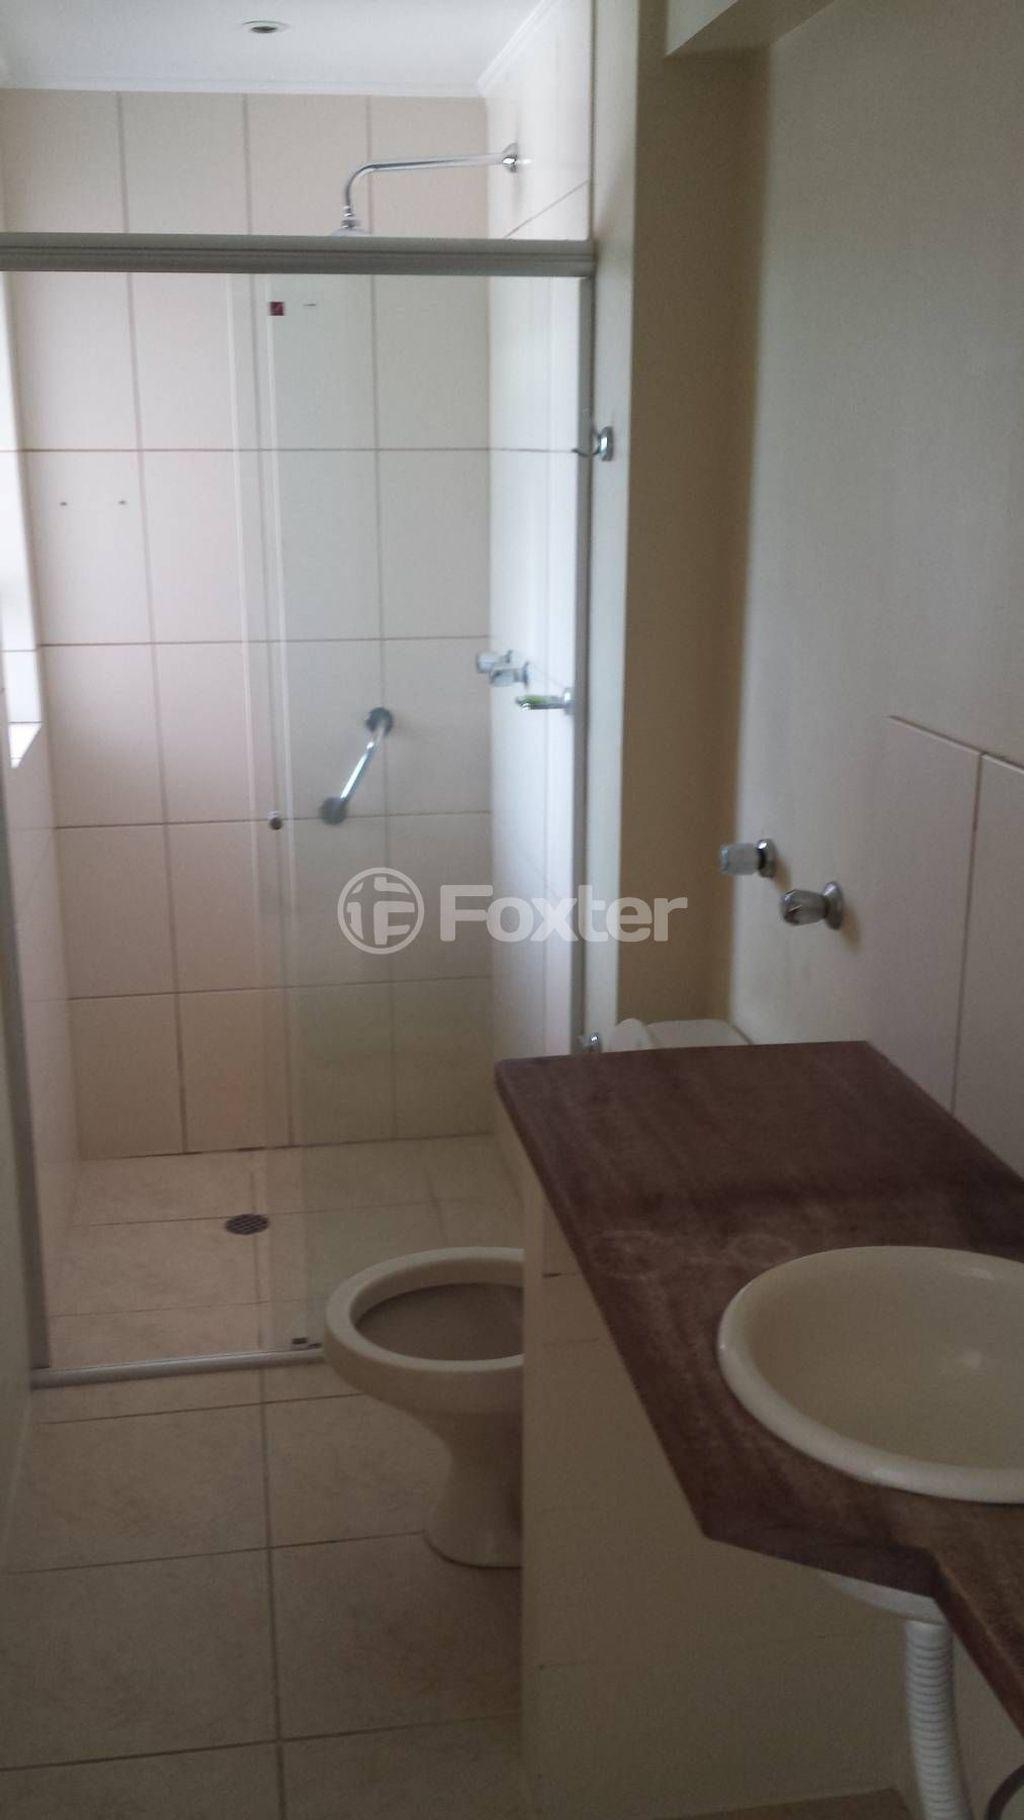 Apto 2 Dorm, Tristeza, Porto Alegre (121191) - Foto 6